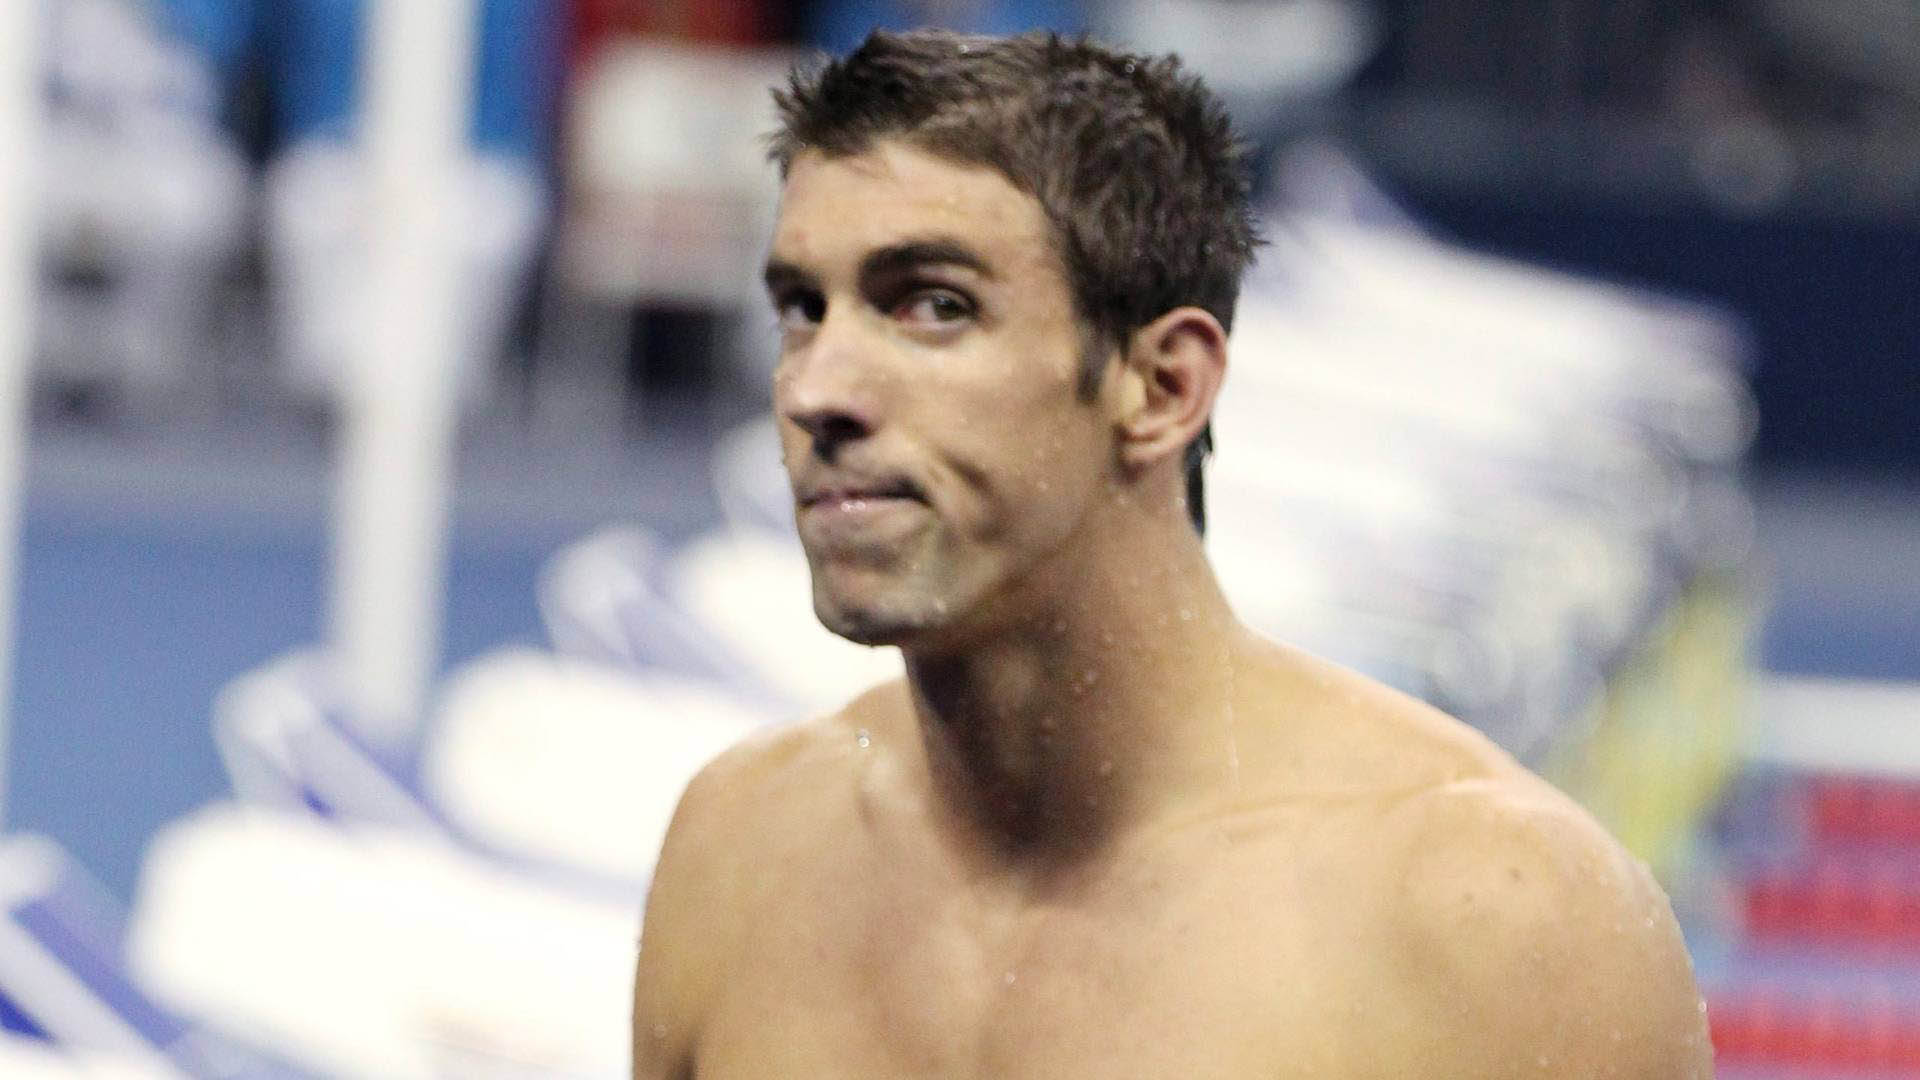 Michael Phelps US Swim Team Wallpaper